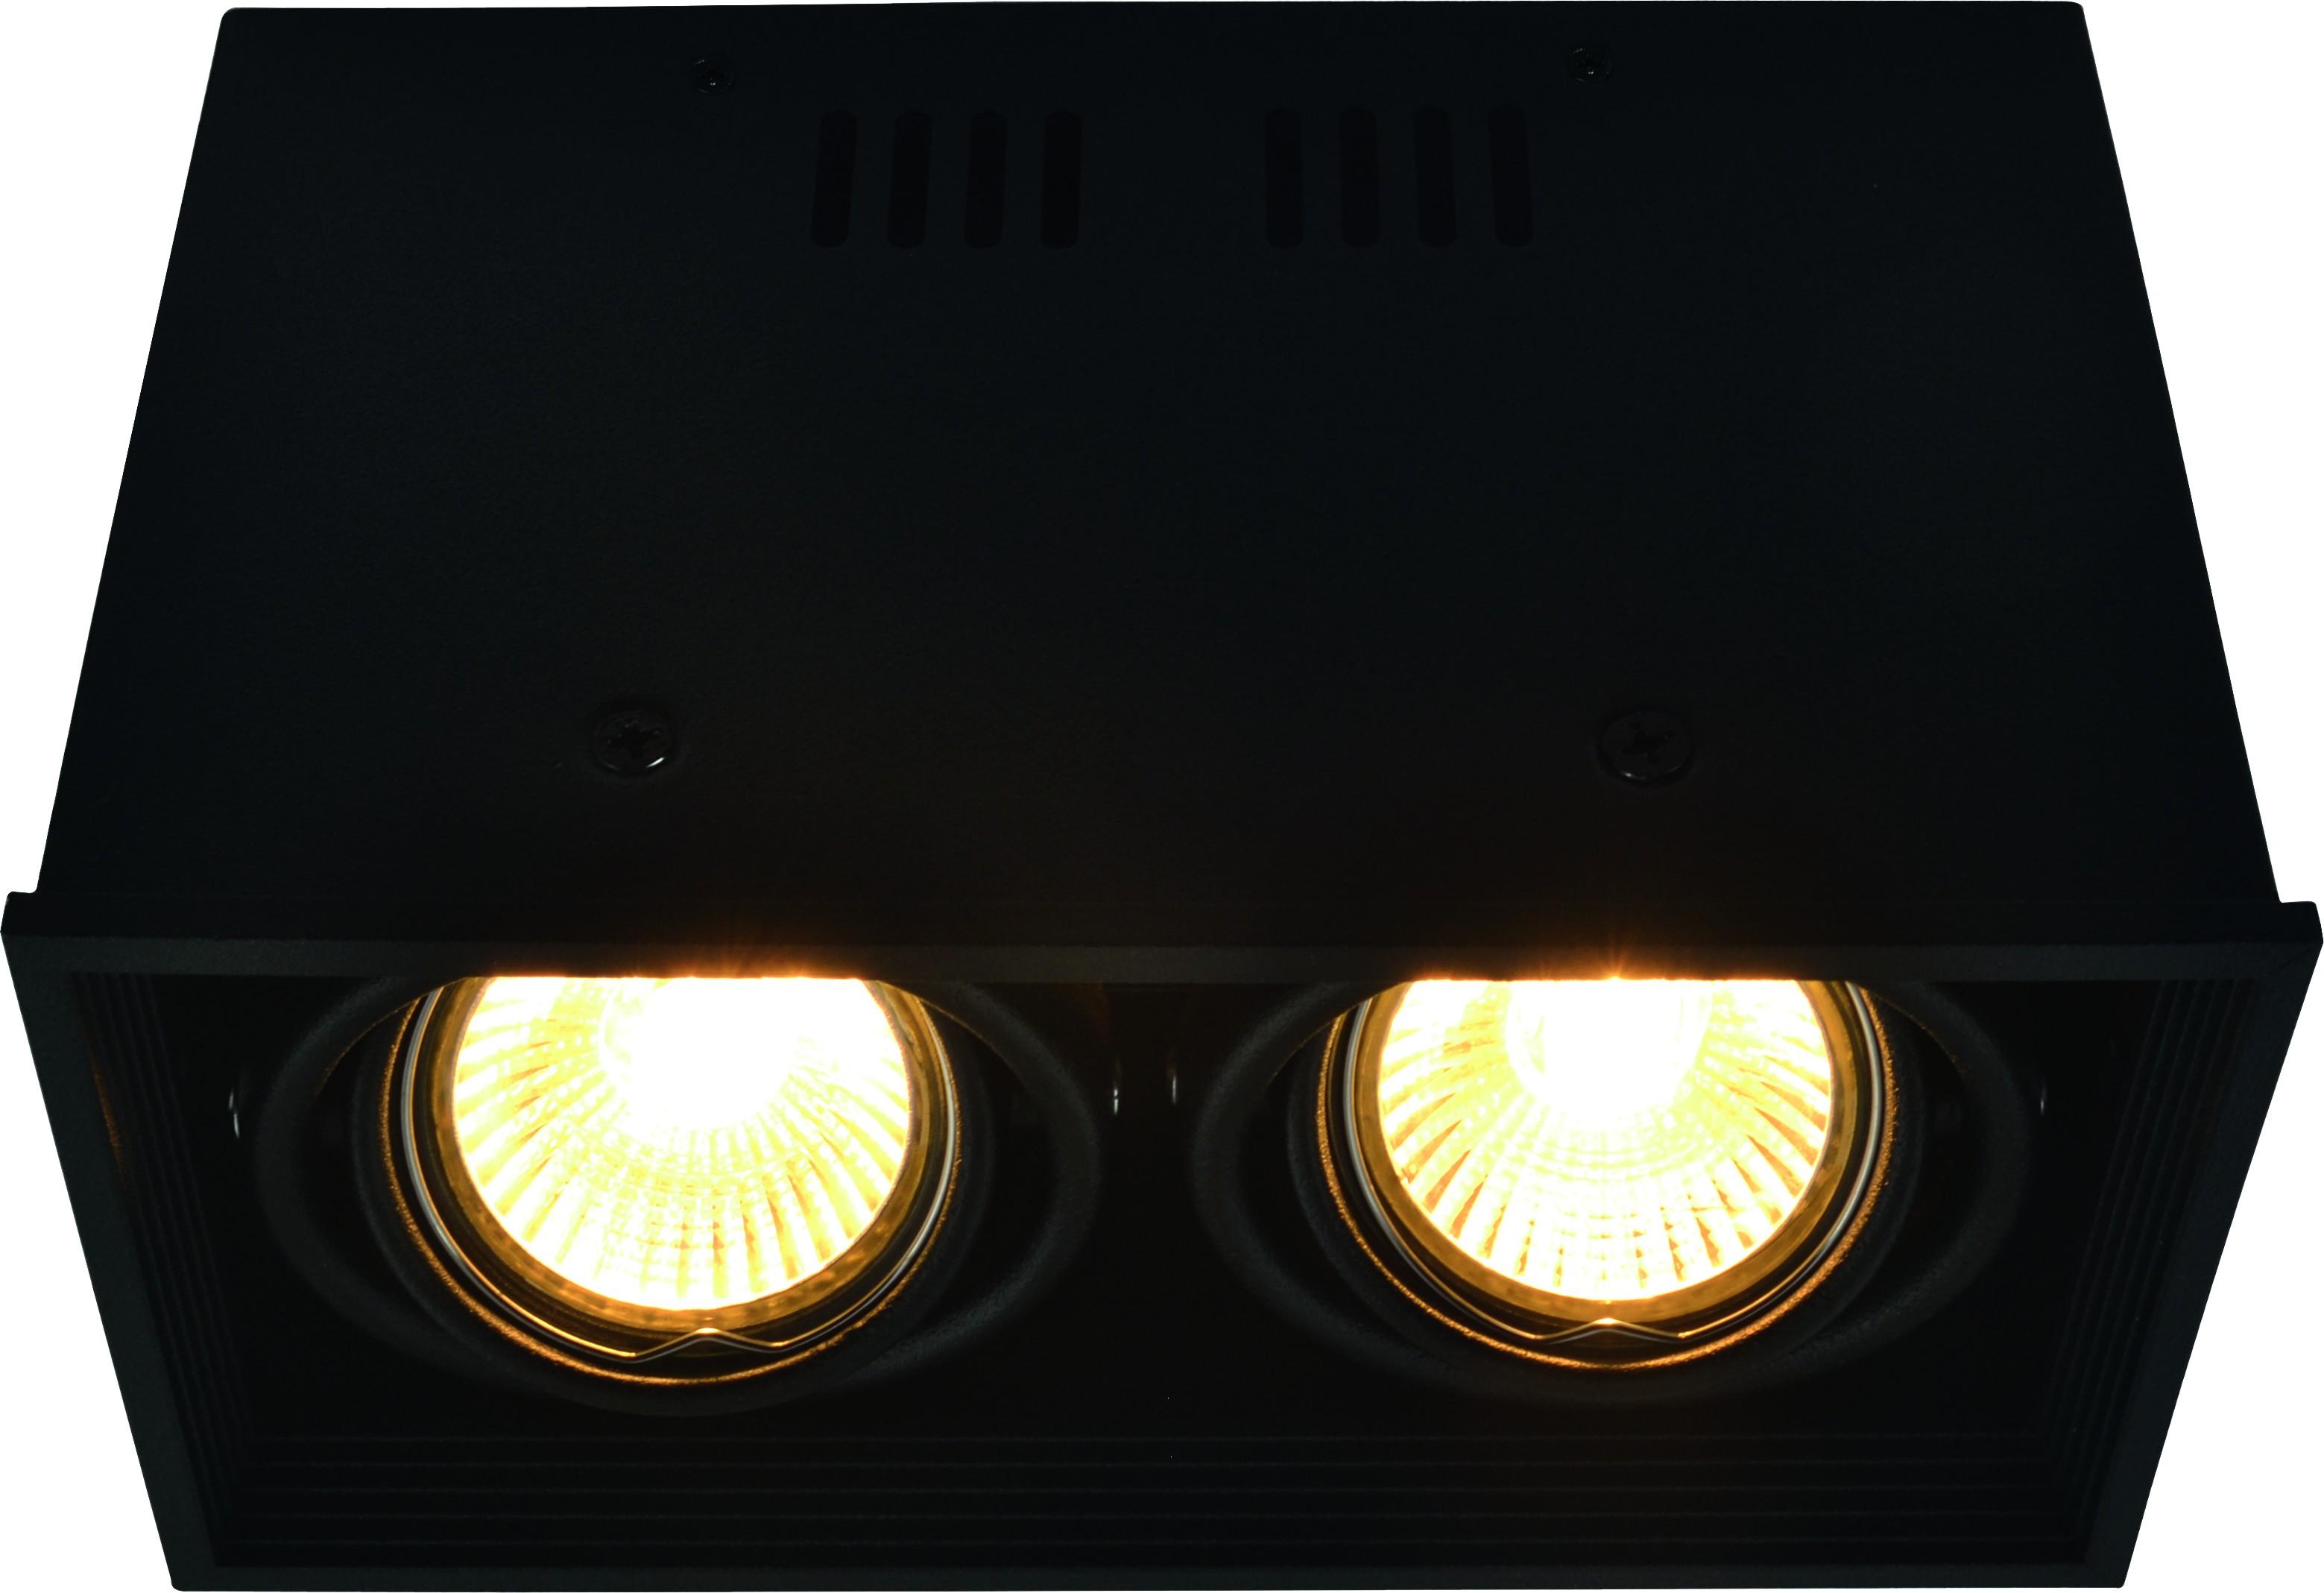 Светильник встраиваемый Arte lamp A5942pl-2bk laptop palmrest for acer as5940 5940g 5942 5942g 60 pfq02 001 ap09z000400